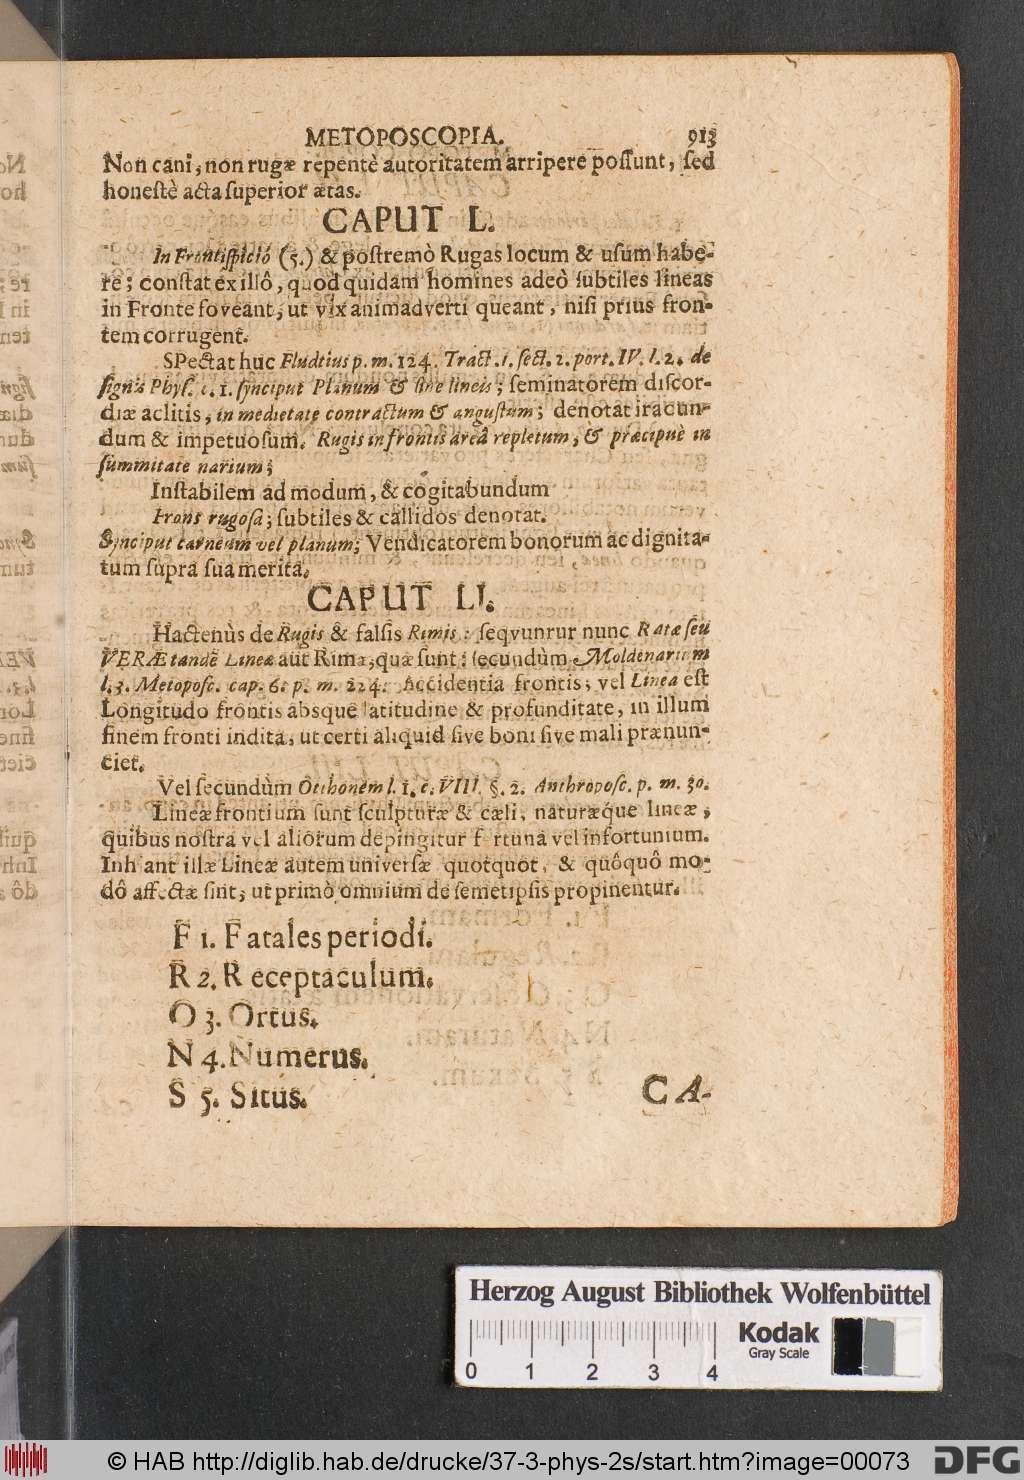 http://diglib.hab.de/drucke/37-3-phys-2s/00073.jpg